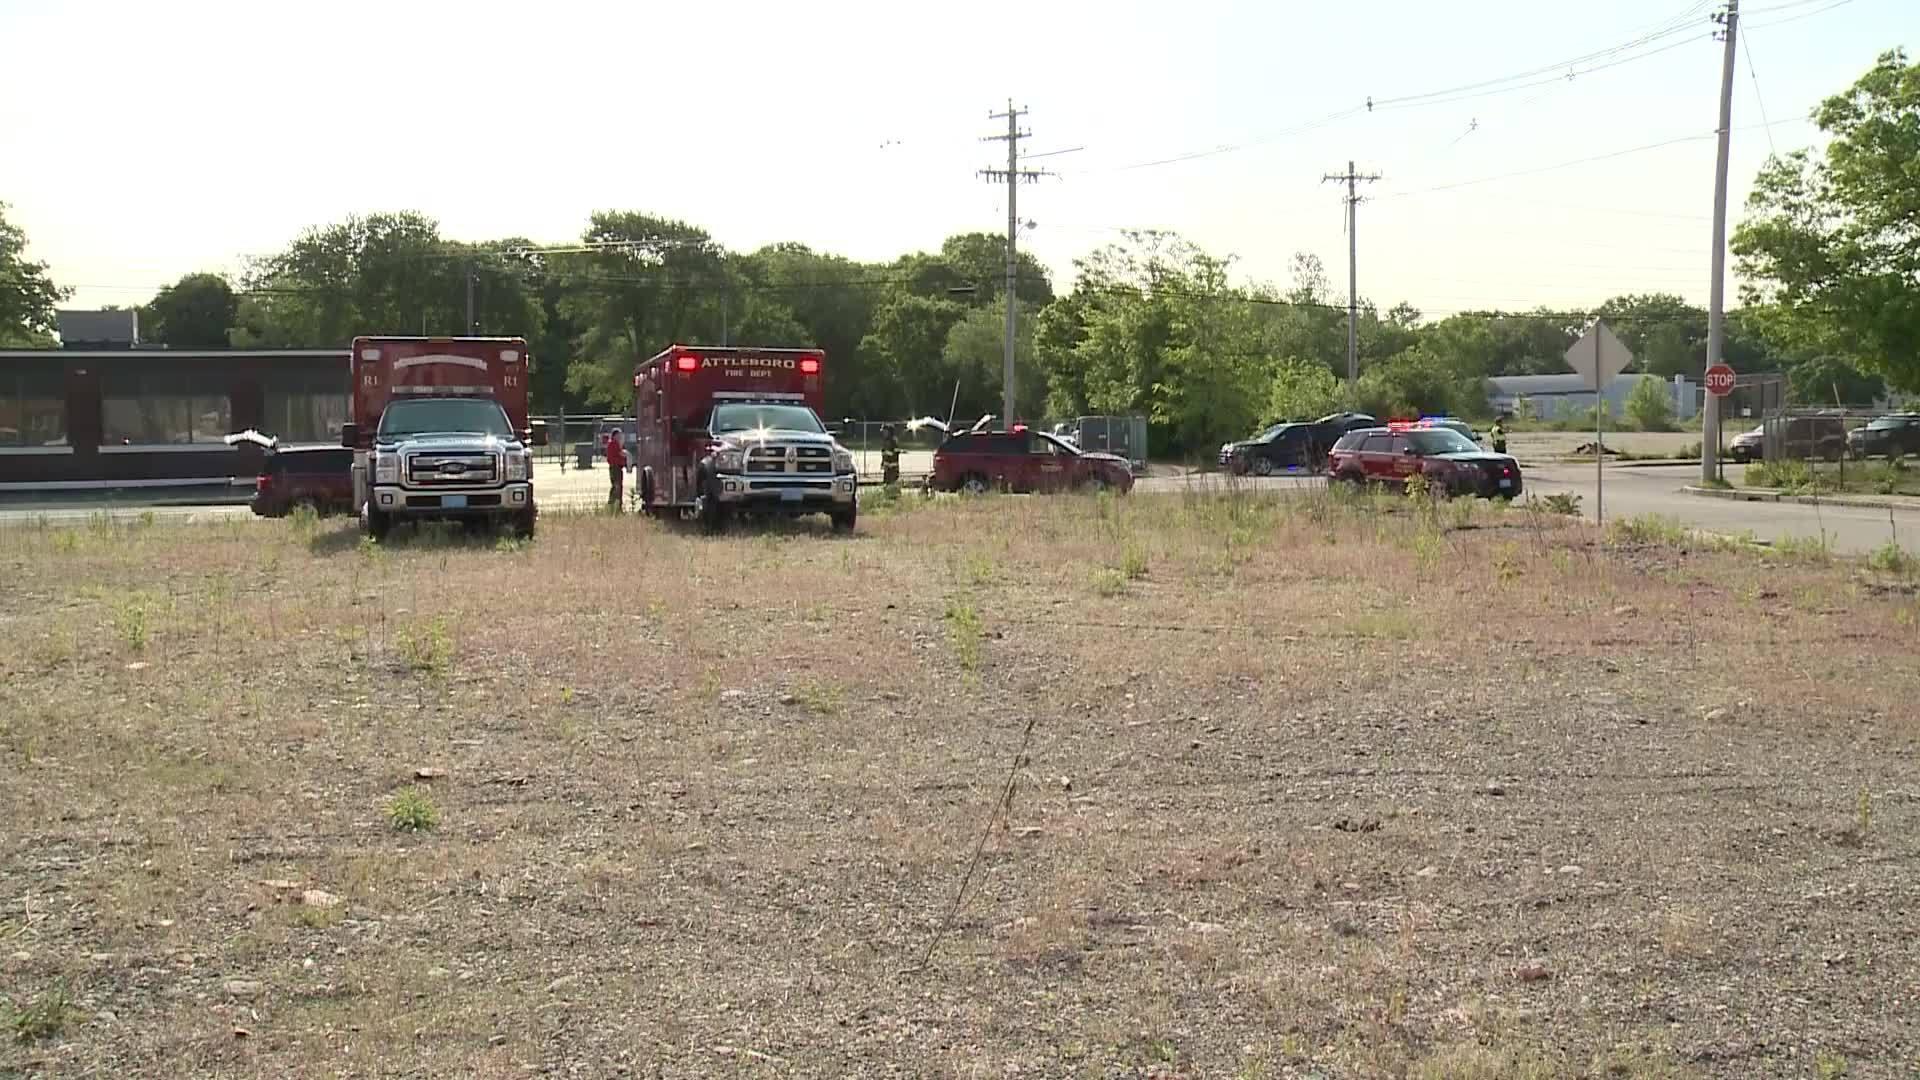 Video Now: Crews respond to hazmat situation in Attleboro